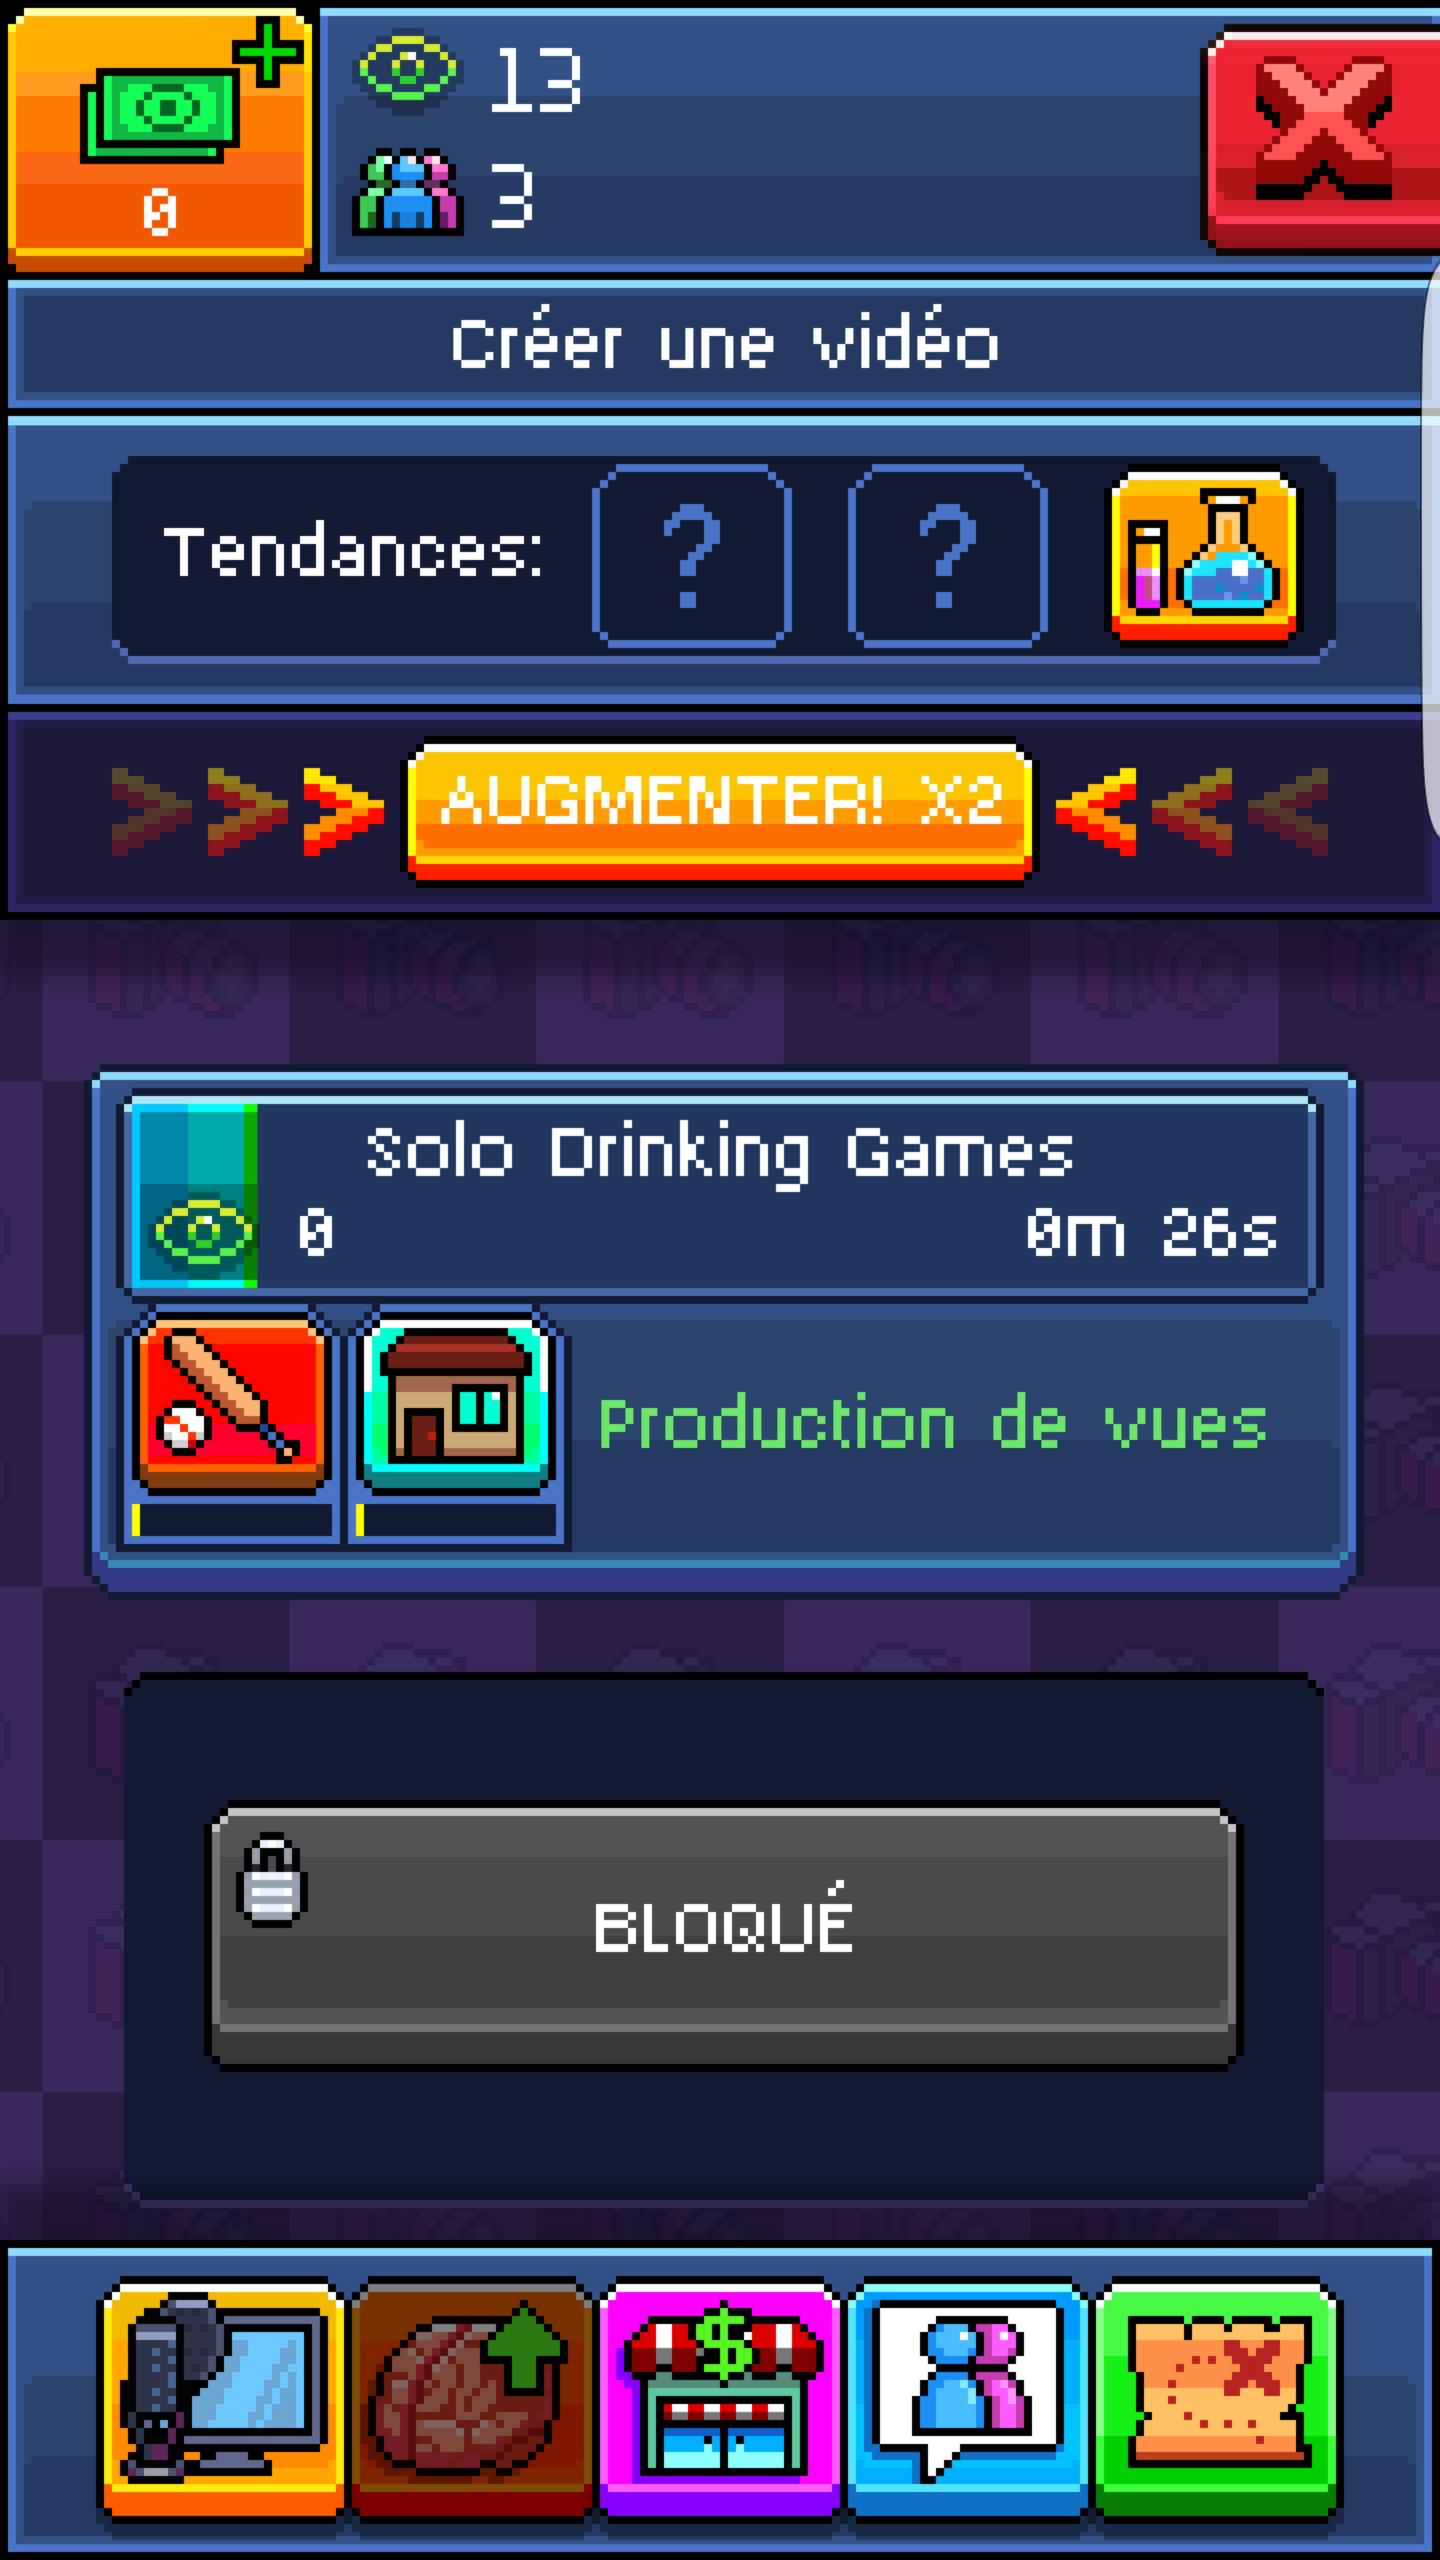 pewdiepies-tuber-simulator-android-3